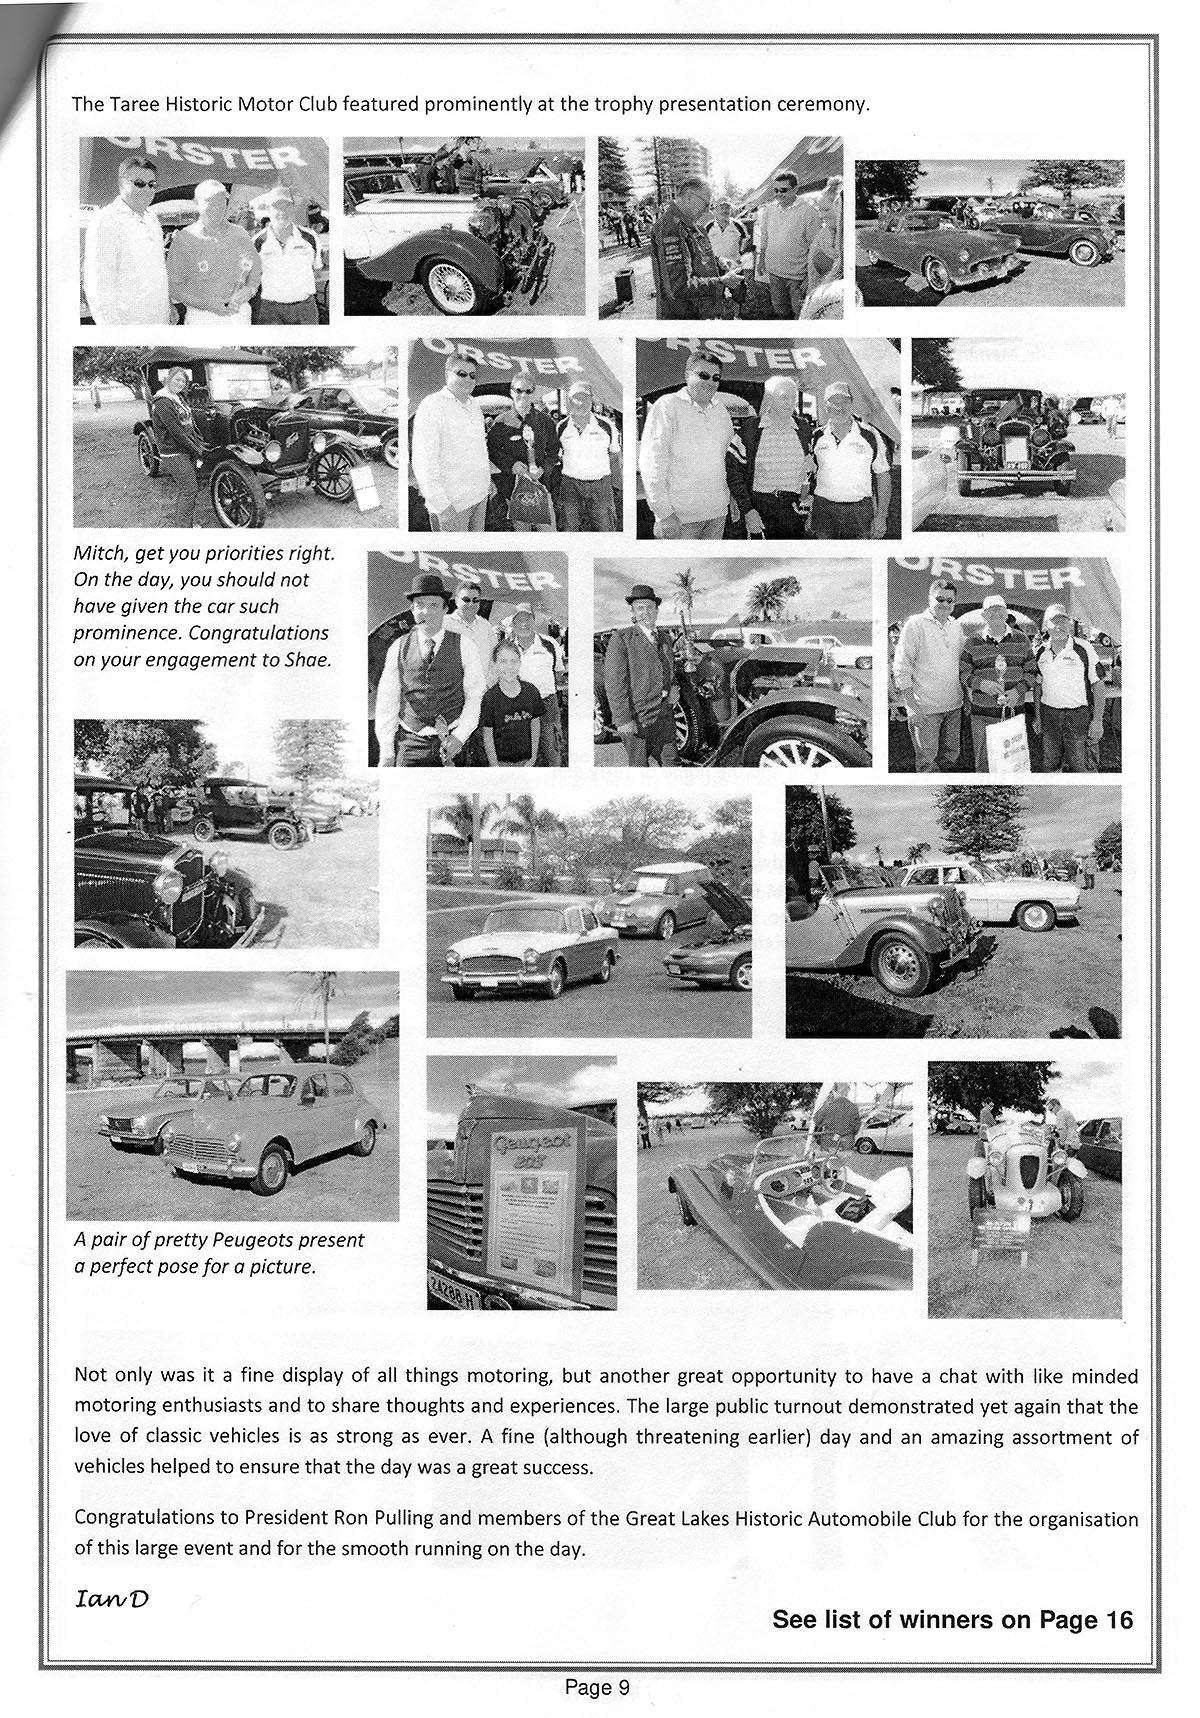 Taree Historic Motor Club